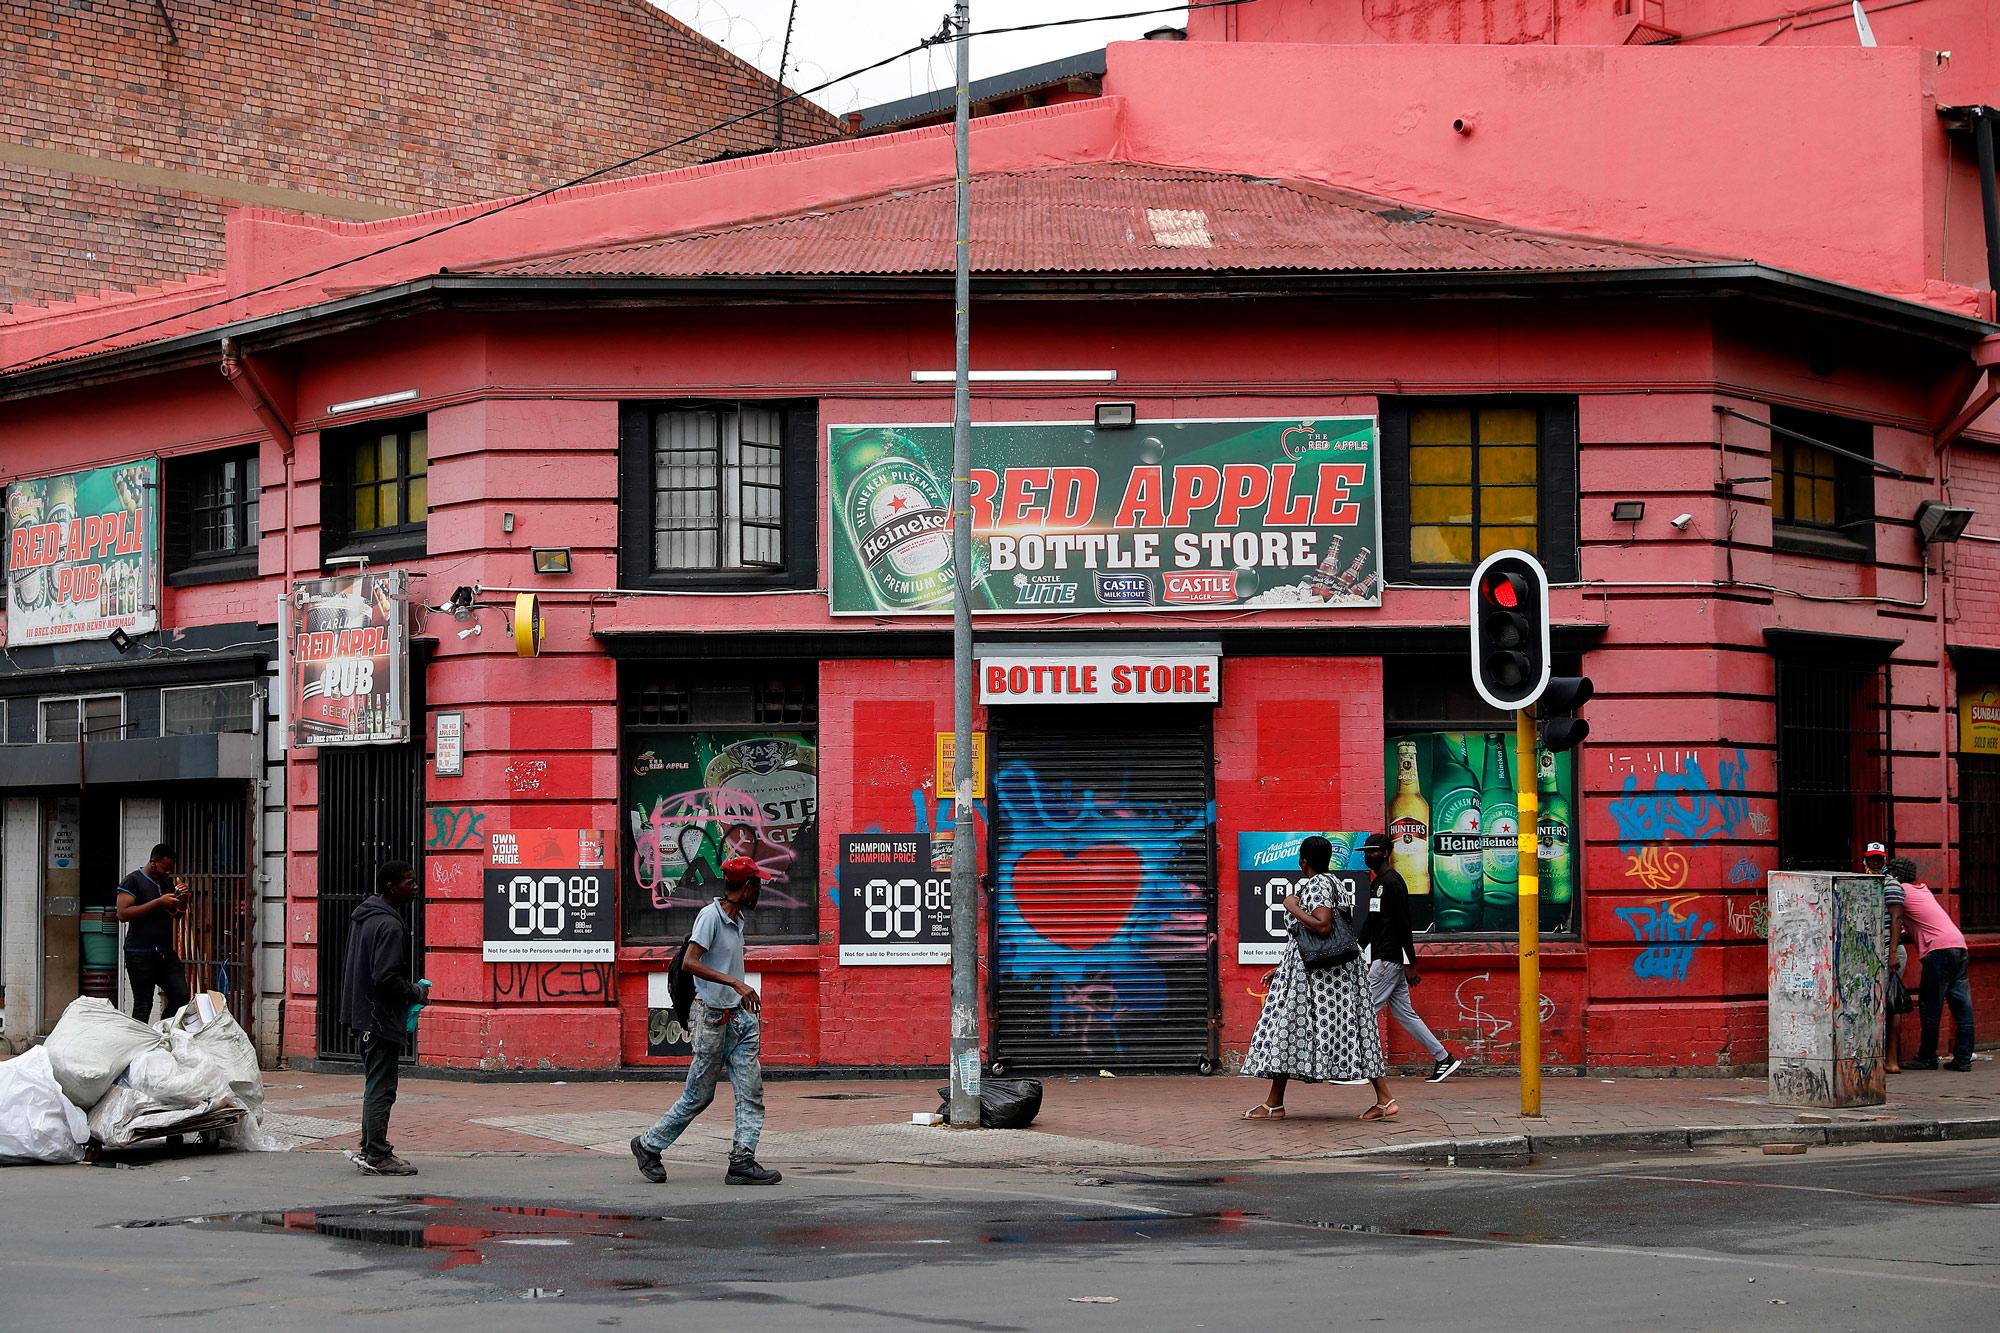 A man walks past a closed liquor store in Newtown, Johannesburg, on December 29, 2020.